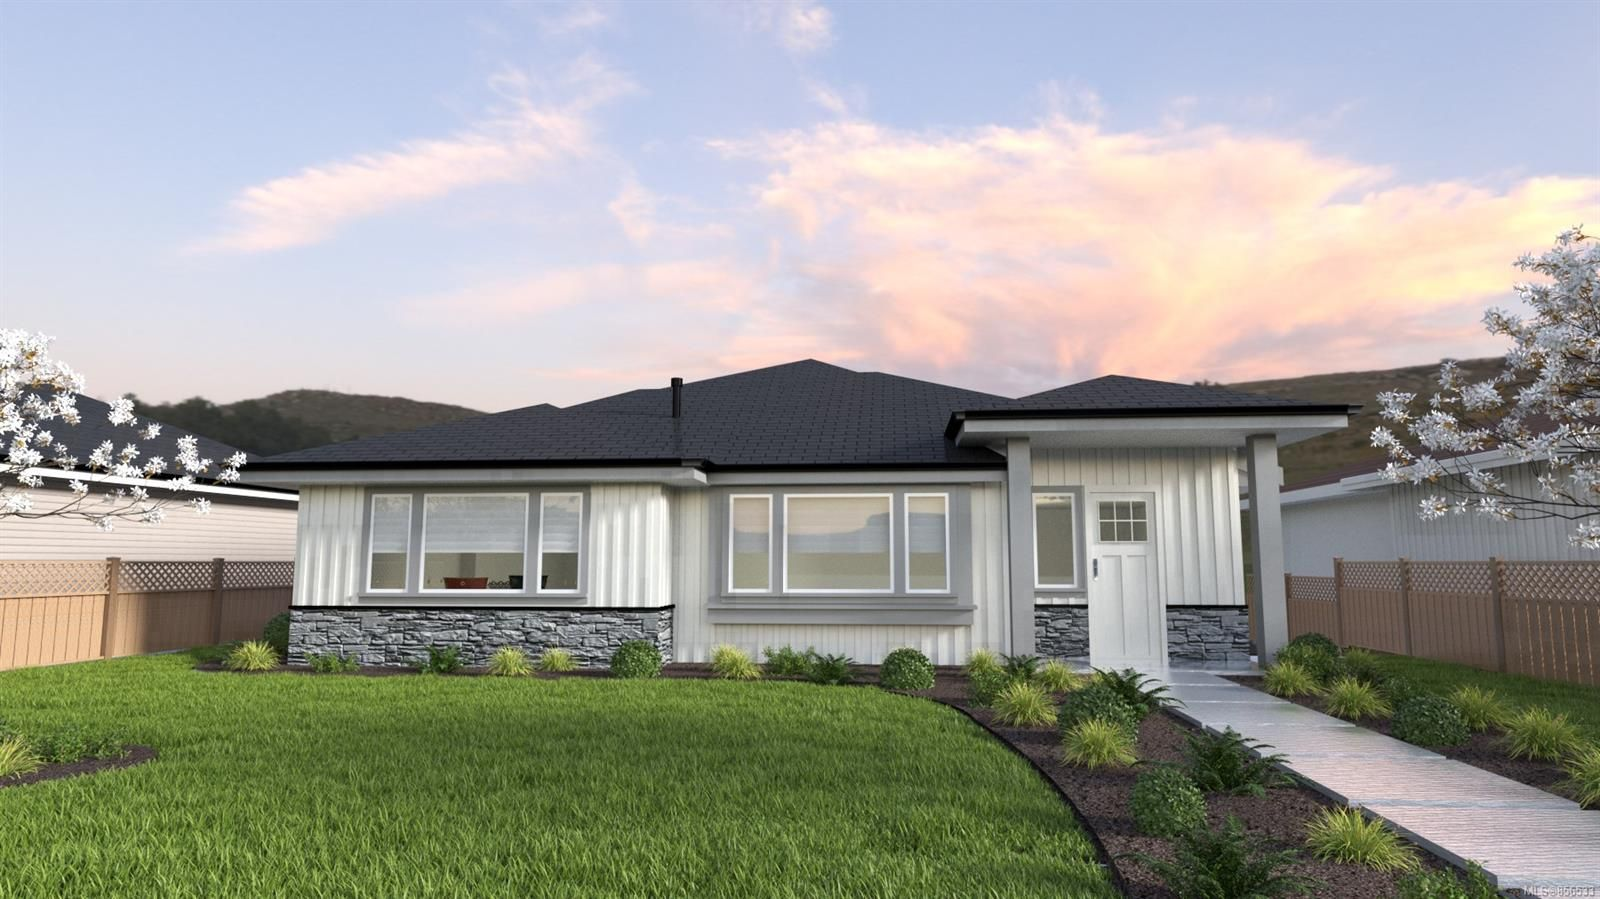 Main Photo: 2028 Ernest Lane in : Du East Duncan House for sale (Duncan)  : MLS®# 856533